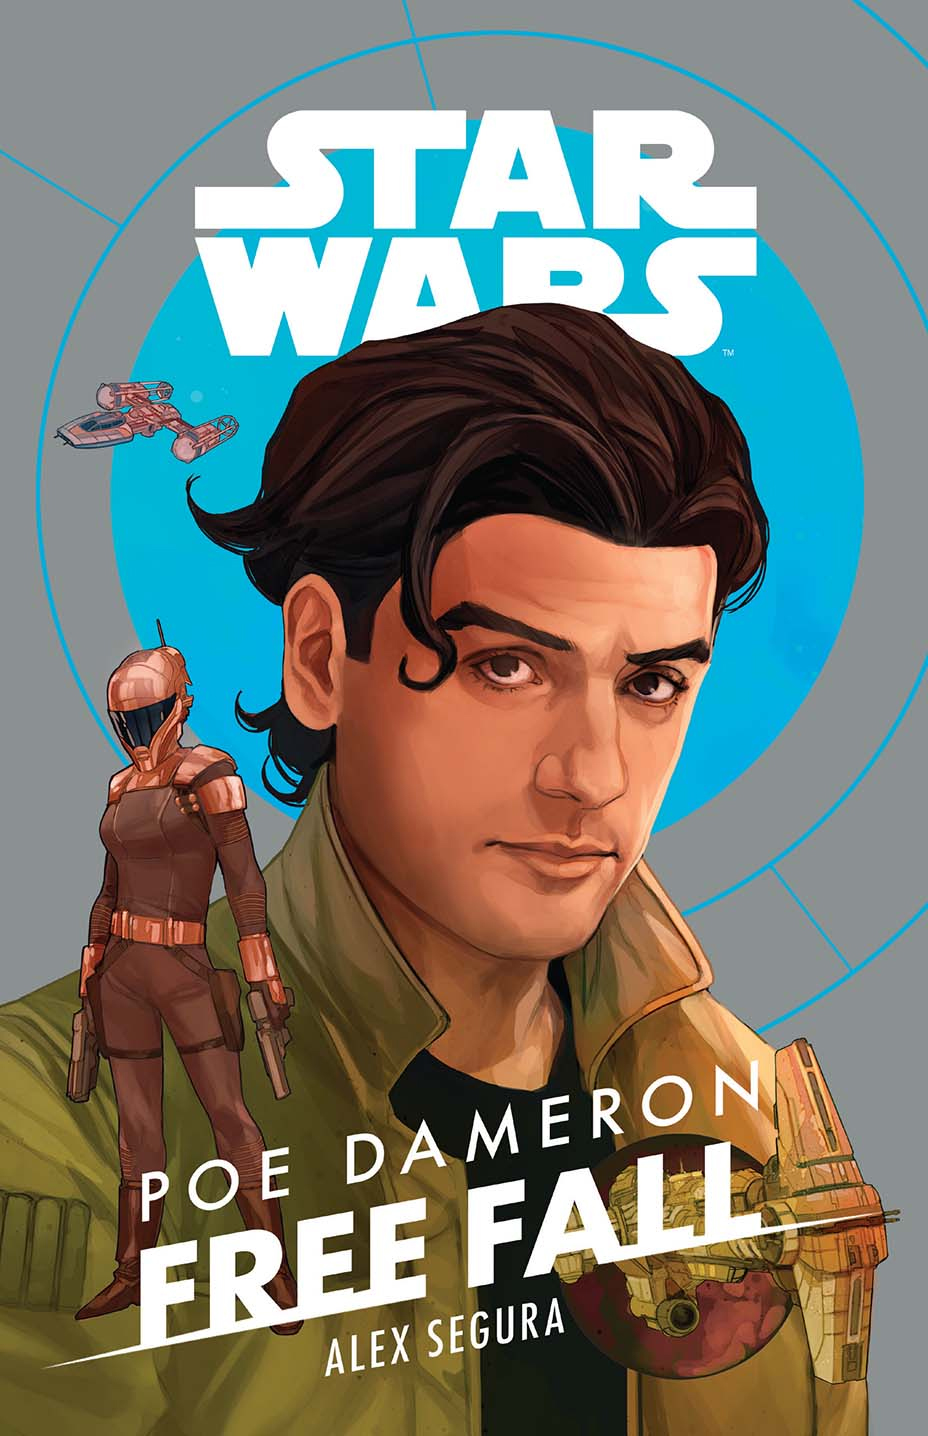 official-poe-dameron-free-fall-ya-novel-cover-full